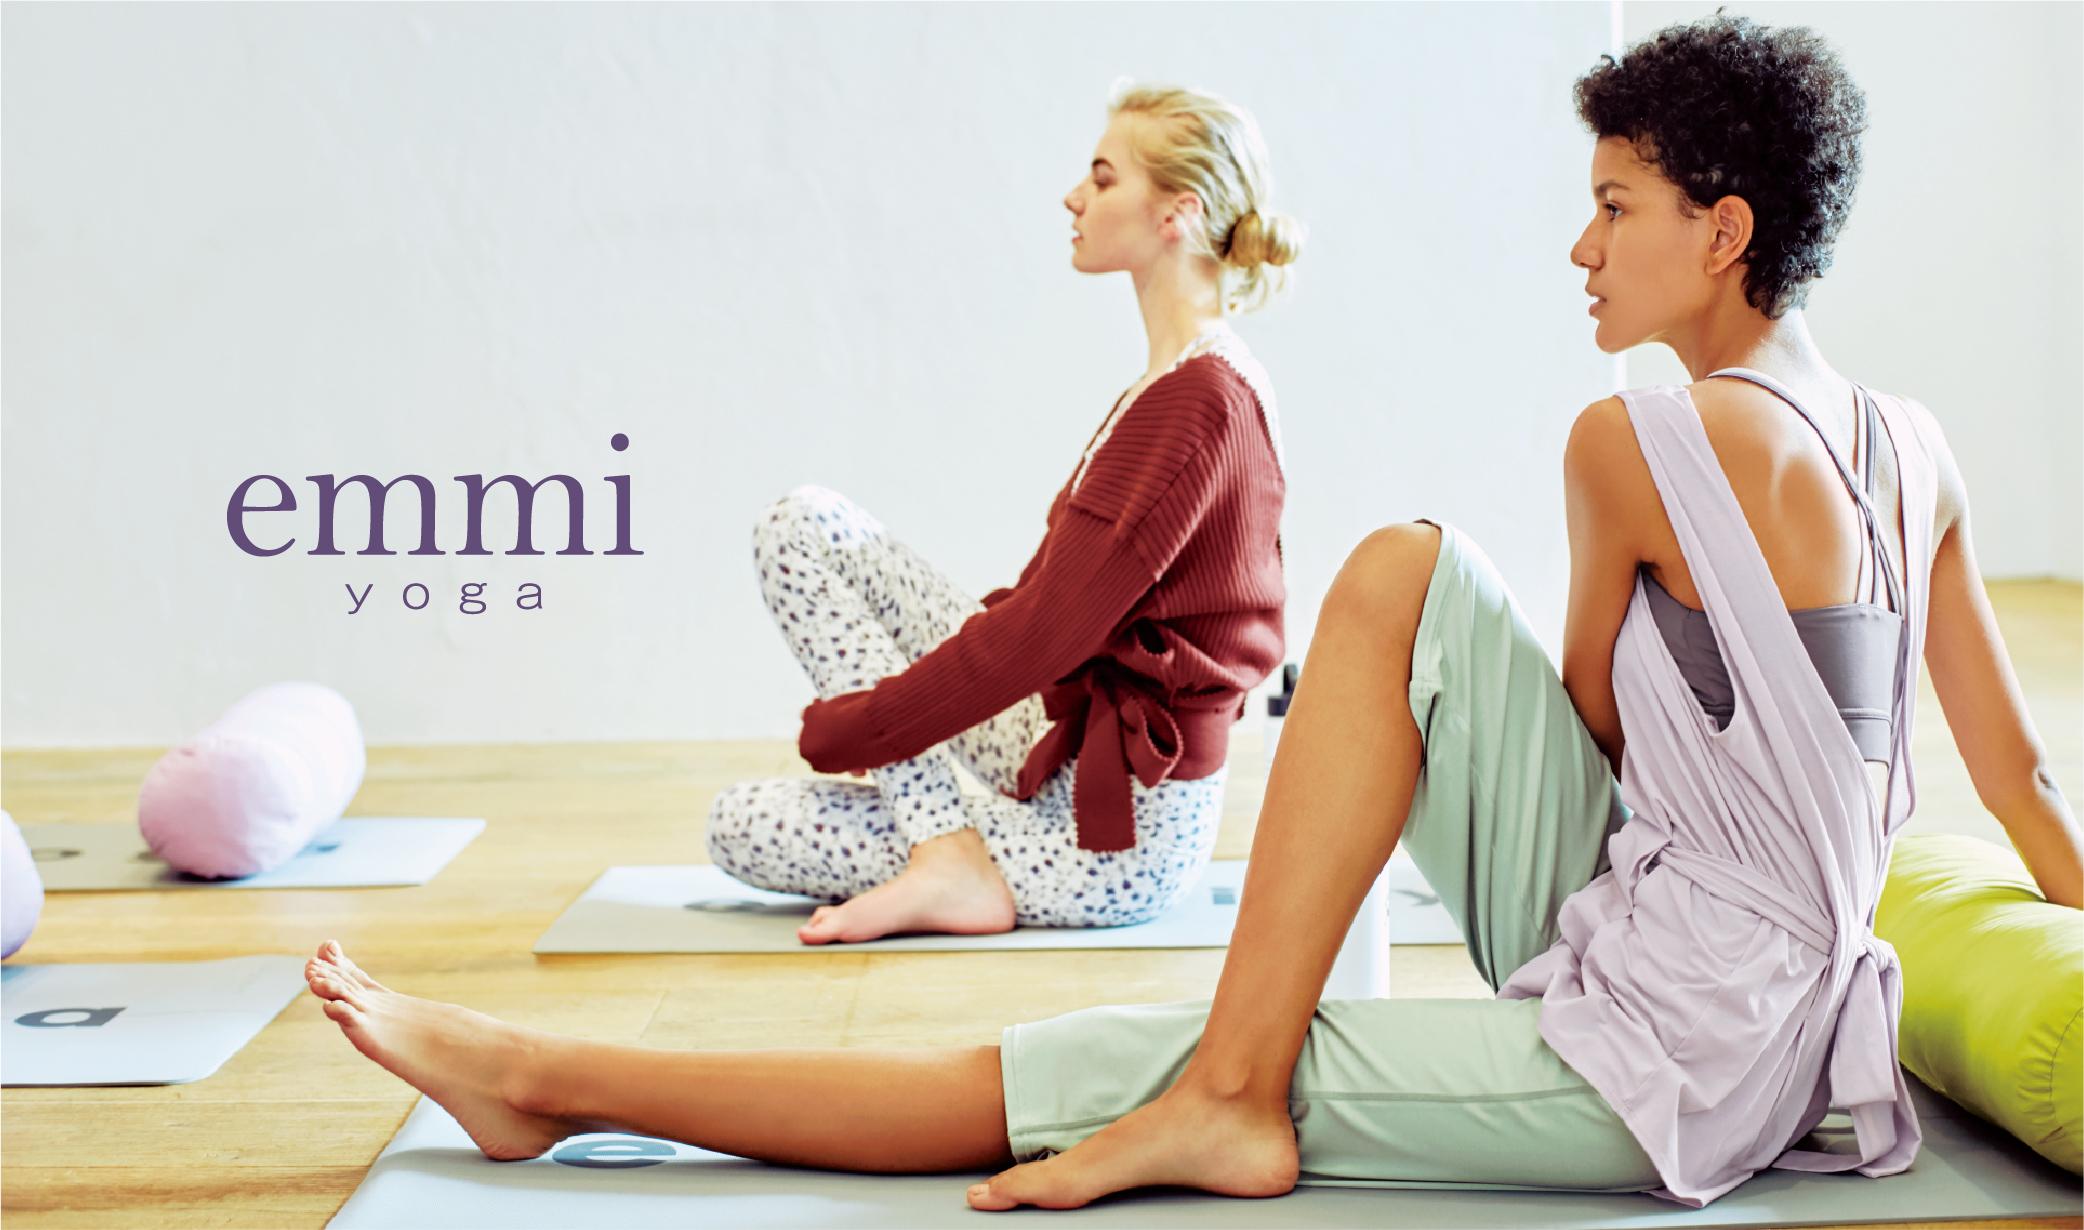 emmi yoga